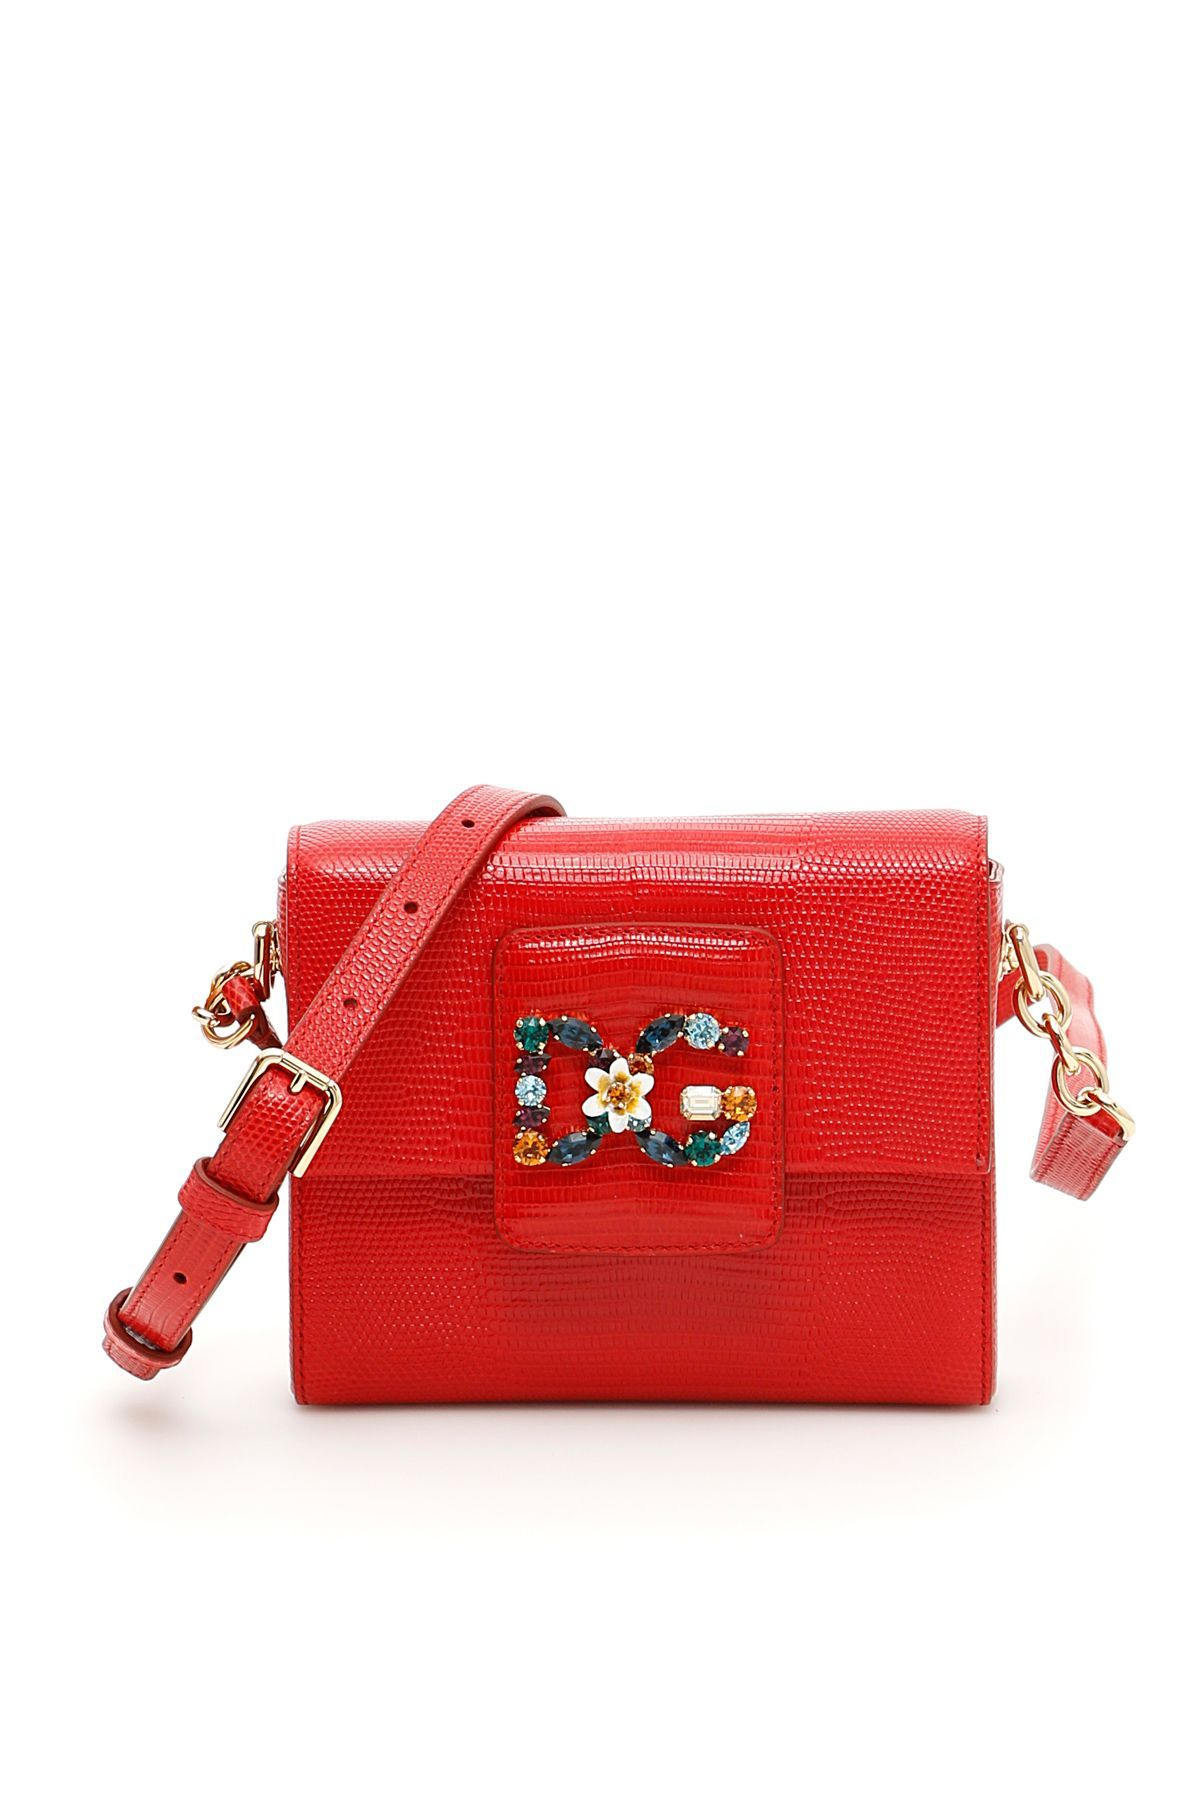 DOLCE   GABBANA DG MILLENNIALS MINIBAG.  dolcegabbana  bags  shoulder bags   leather  lining  crystal   ea2a5ab075a81